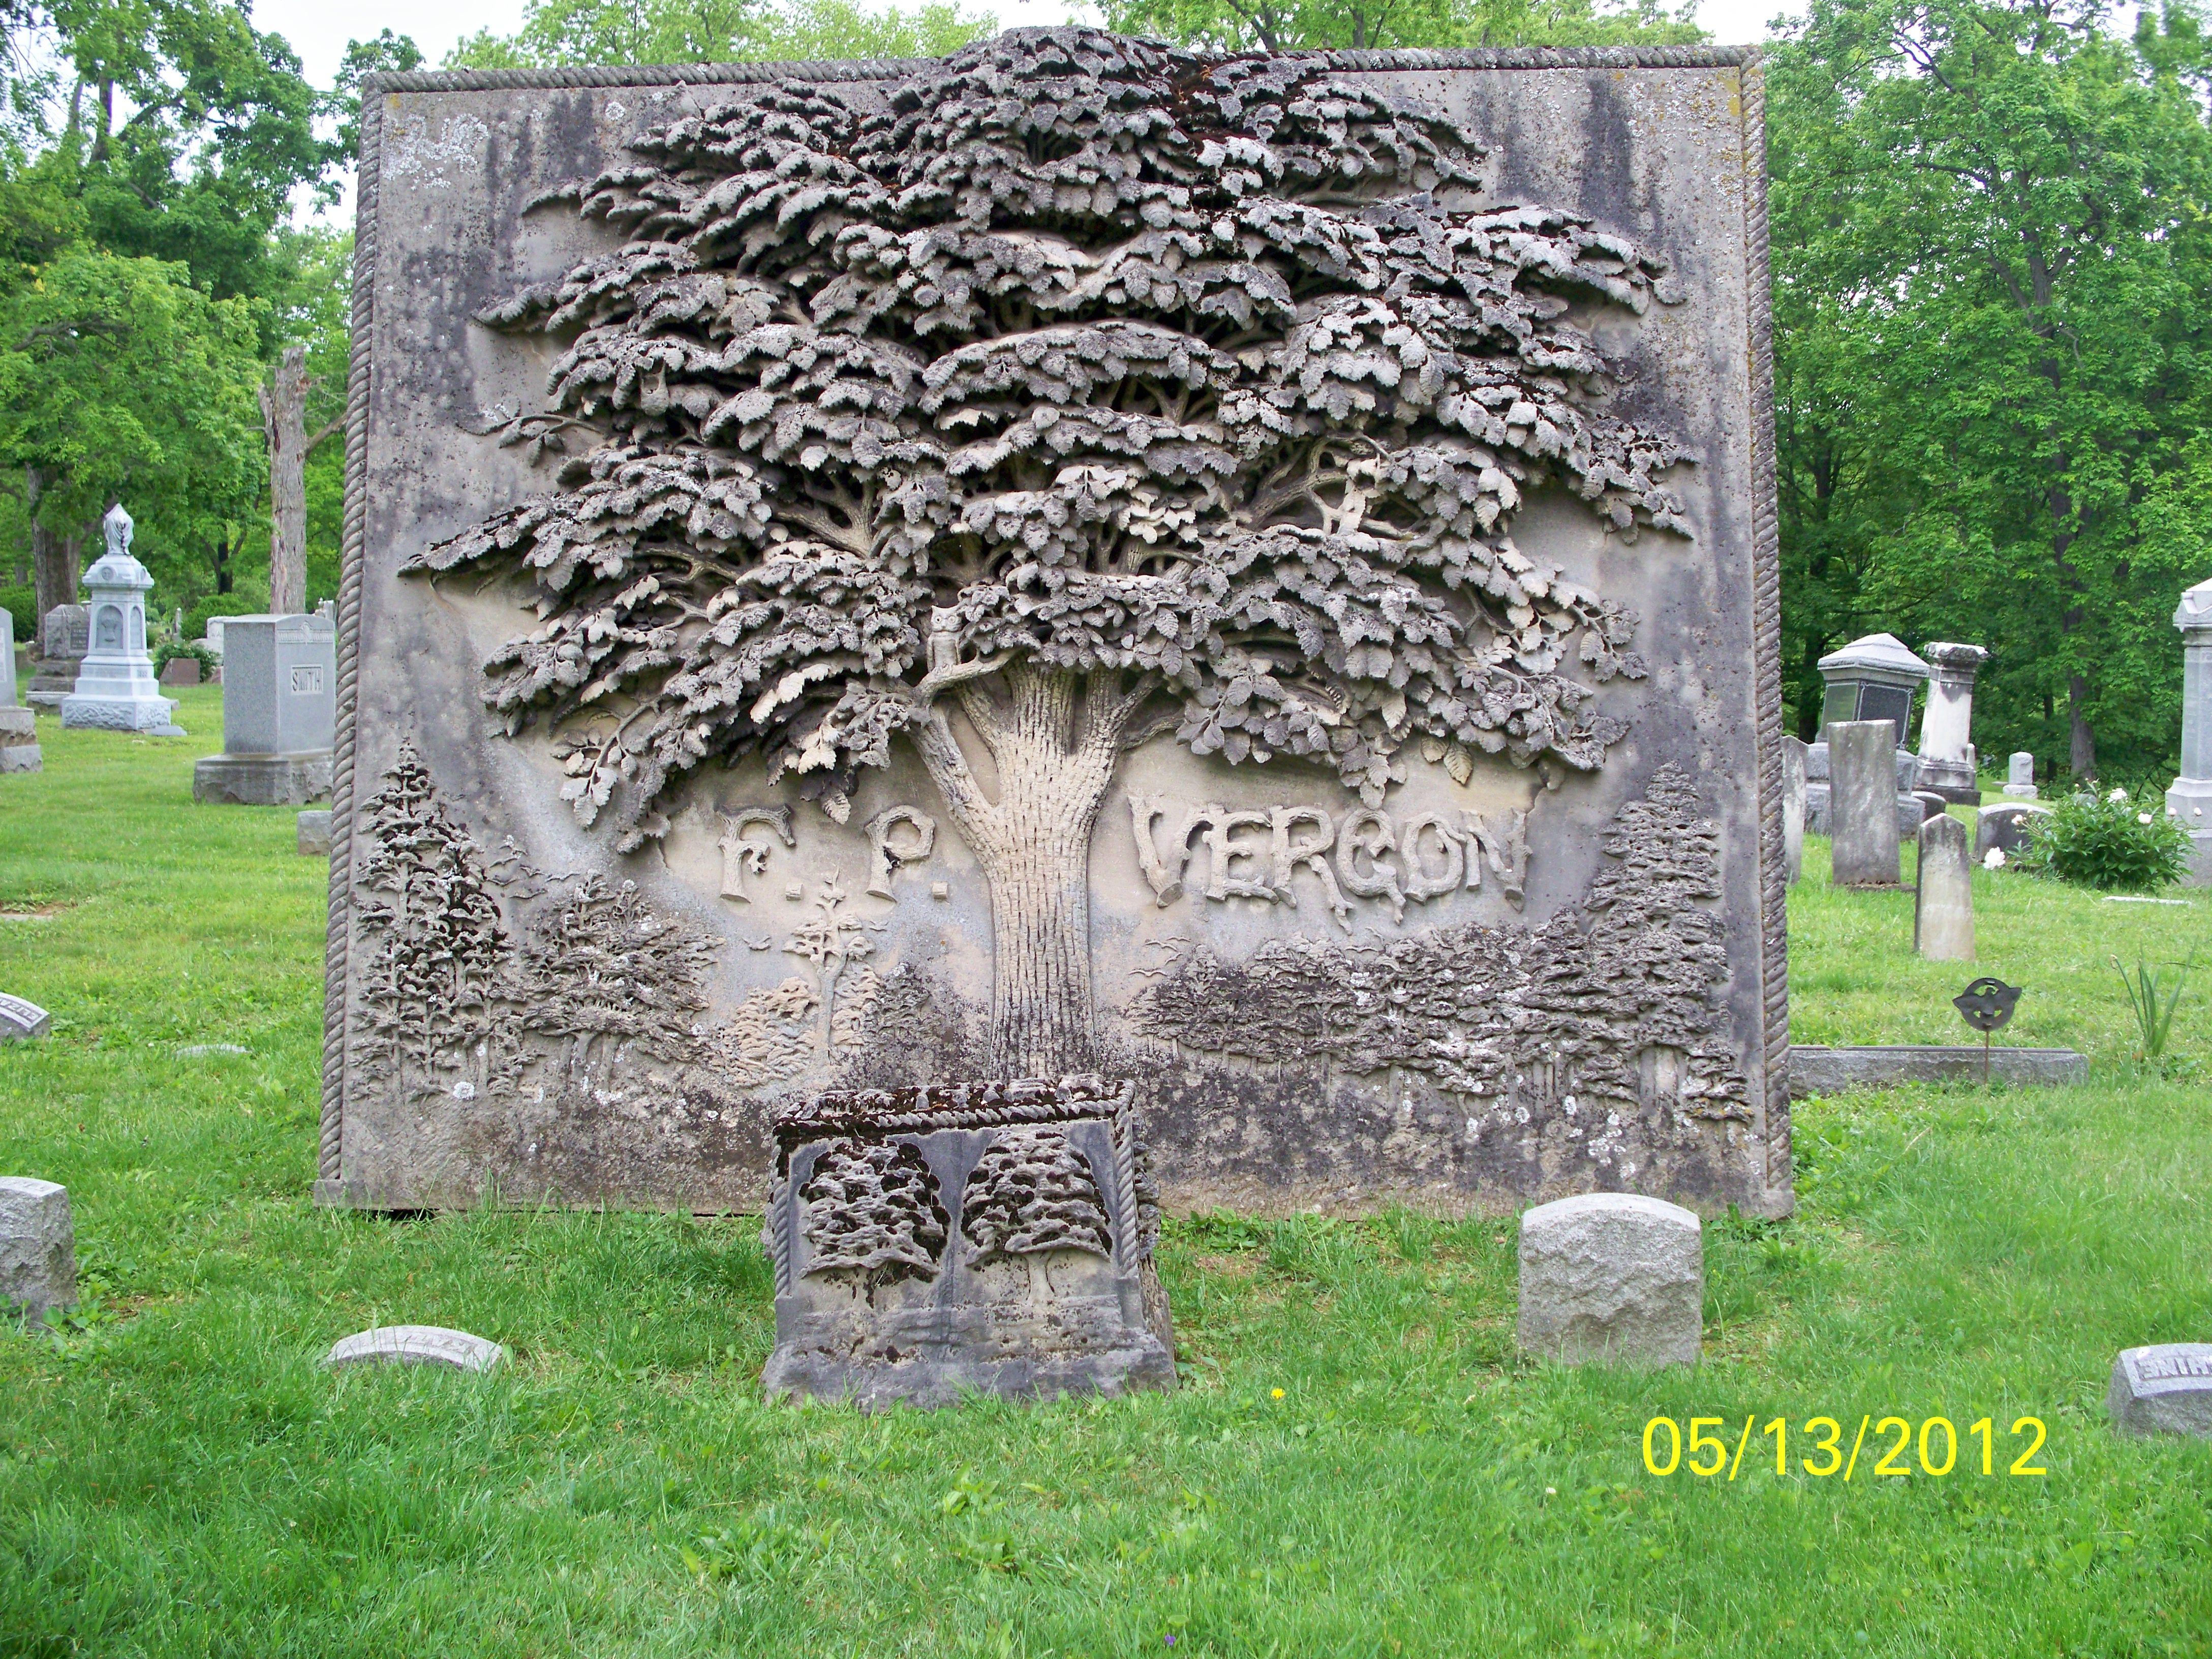 Vergon Monument Oak Grove Cemetery Delaware Ohio Gravestone Cemeteries Ohio Travel